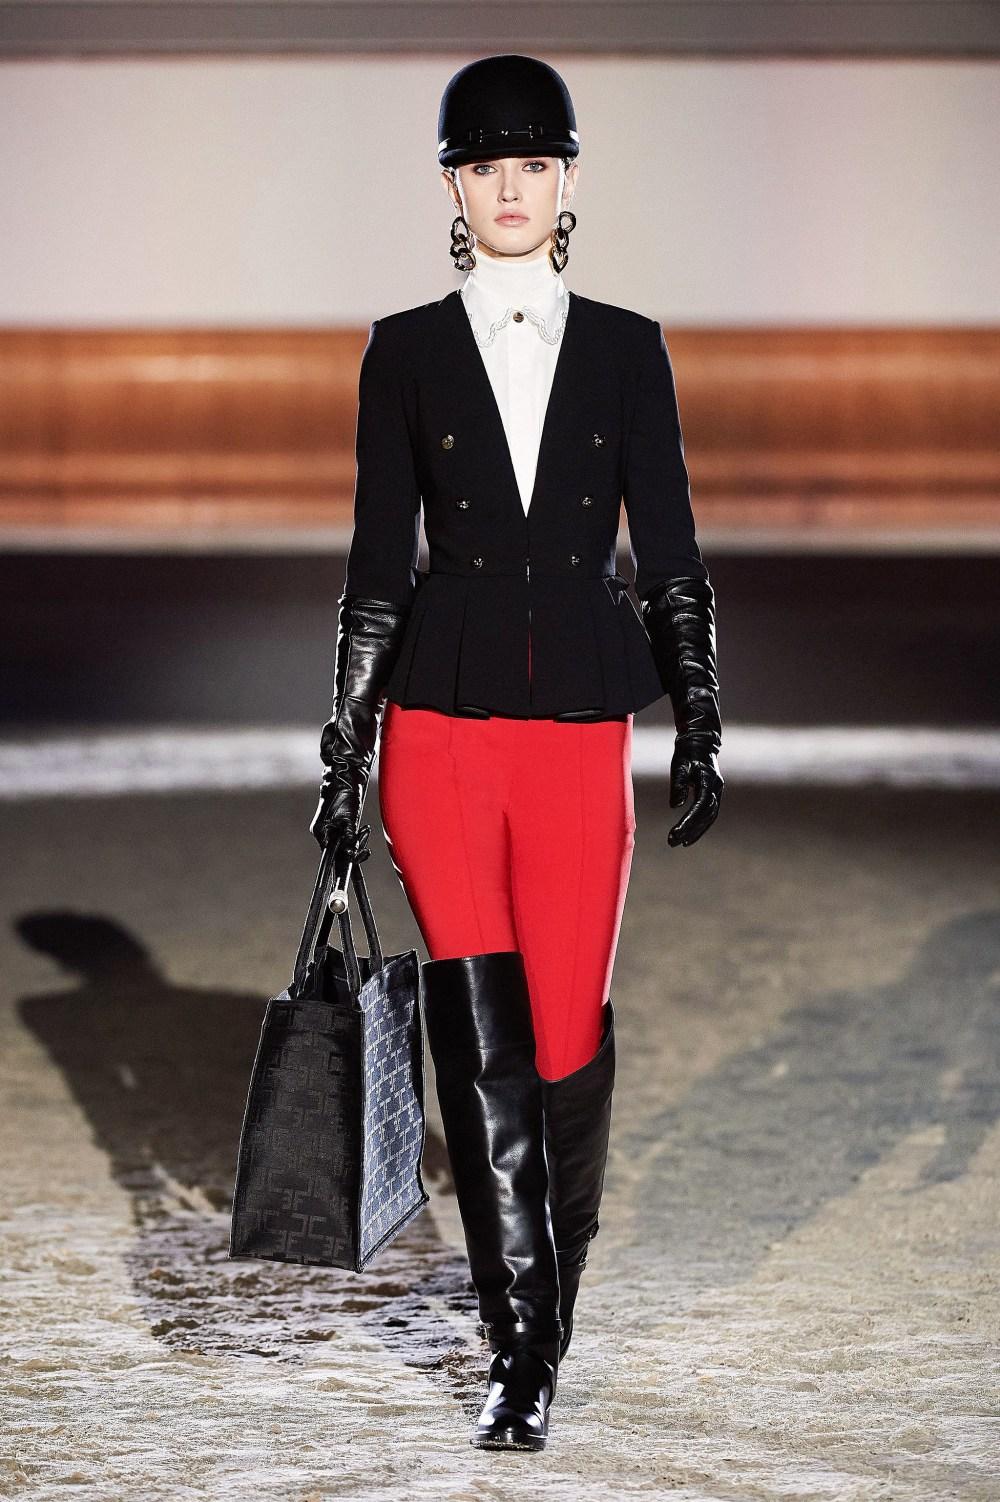 Elisabetta Franchi: Elisabetta Franchi Fall Winter 2021-22 Fashion Show Photo #38